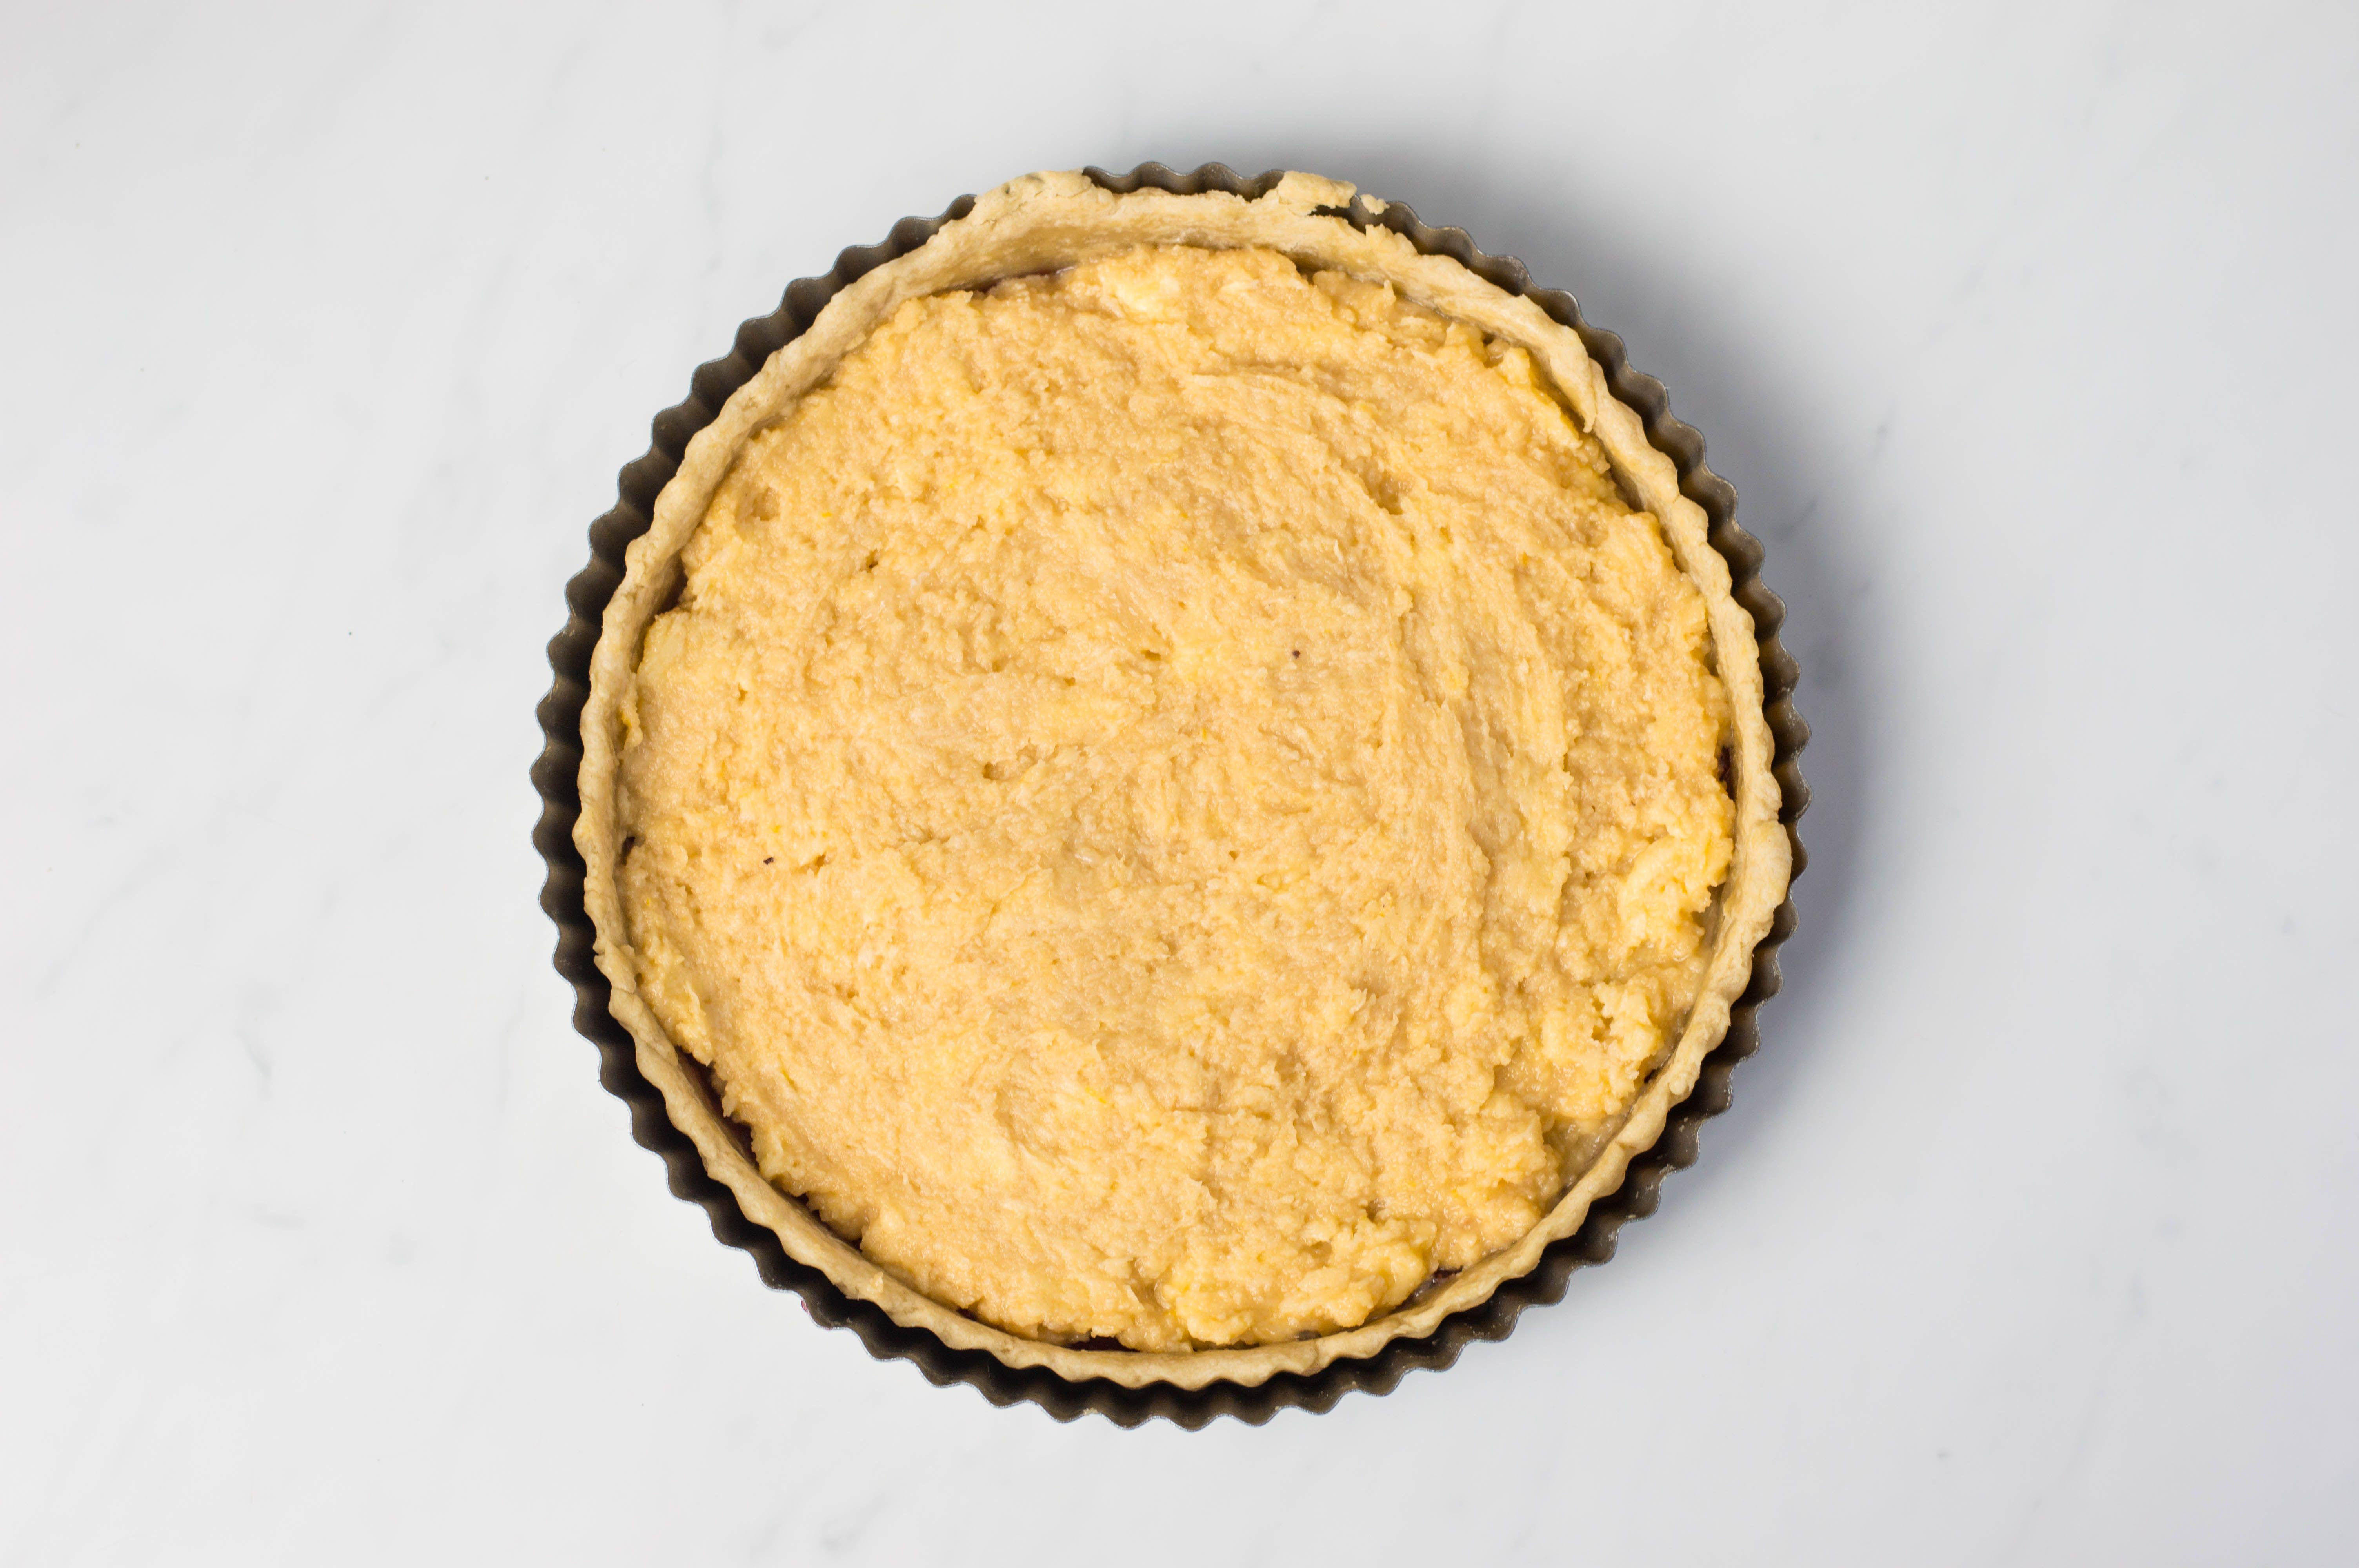 Tart pan filled with almond mixture